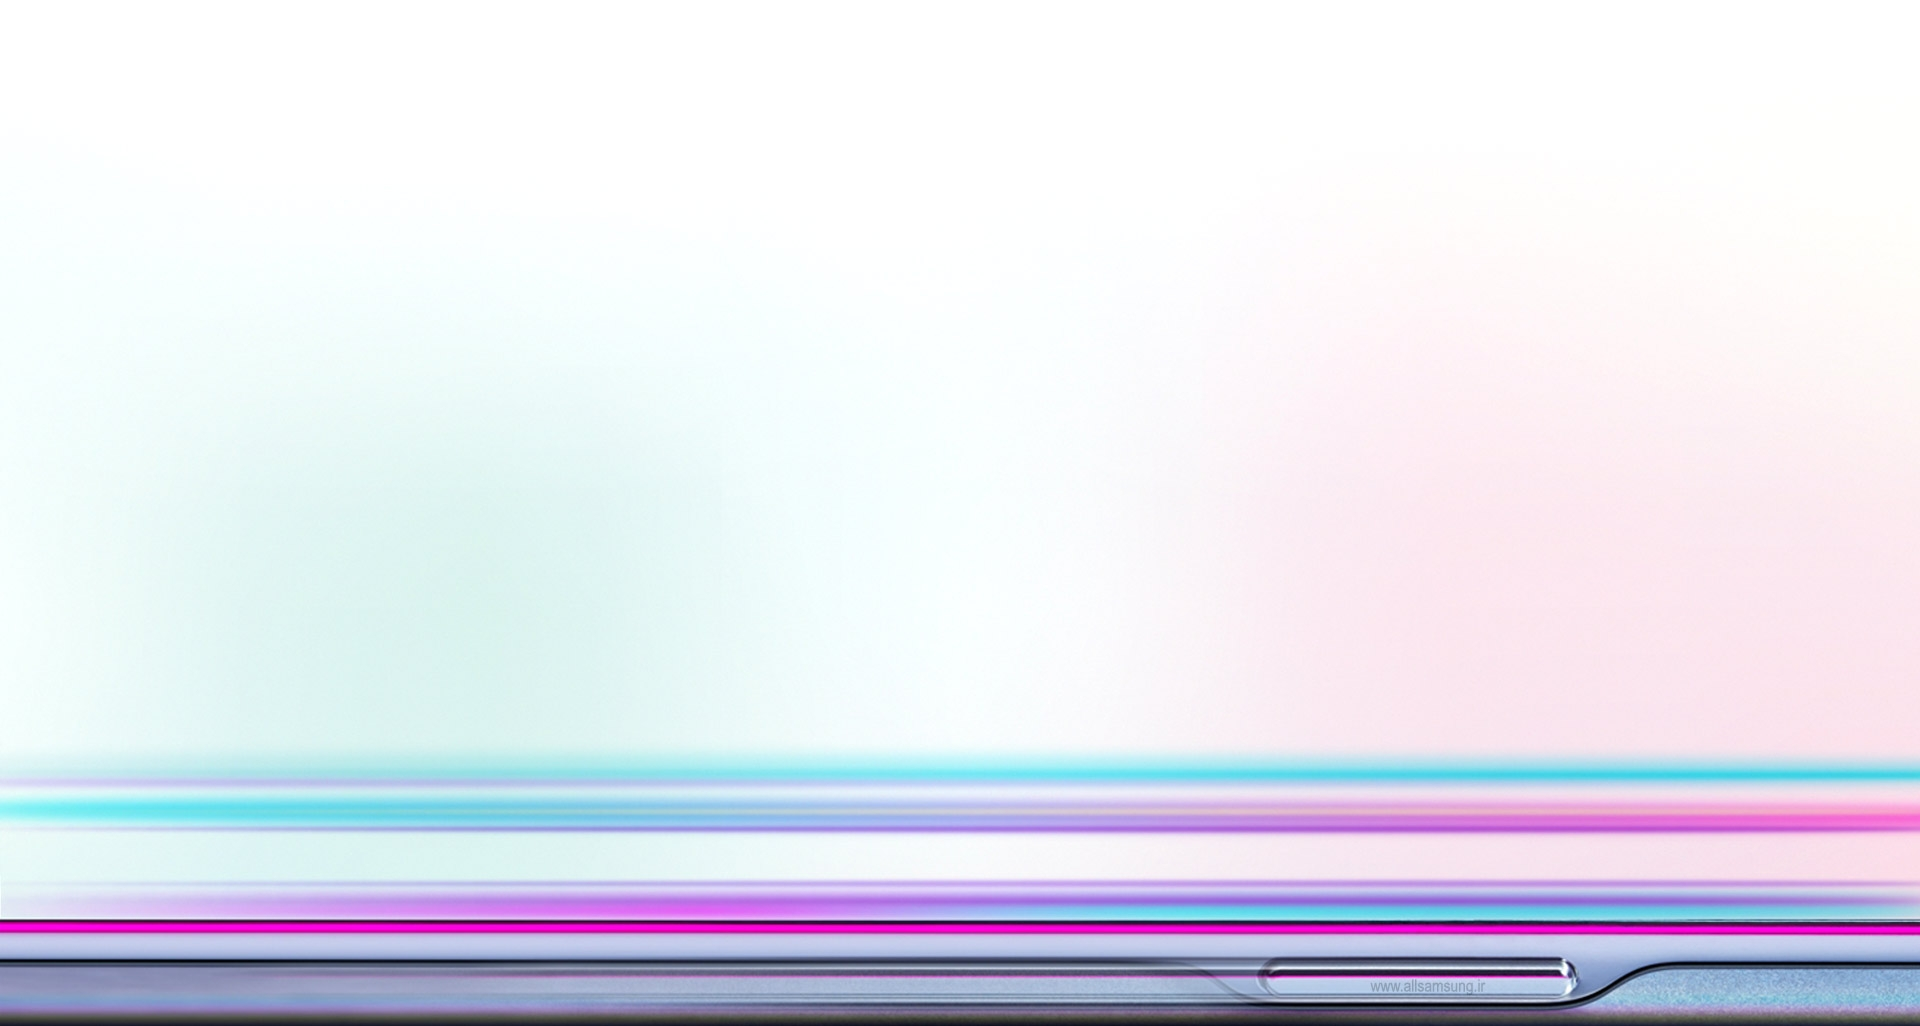 پخش فوق سریع گلکسی S10 5G سامسونگ